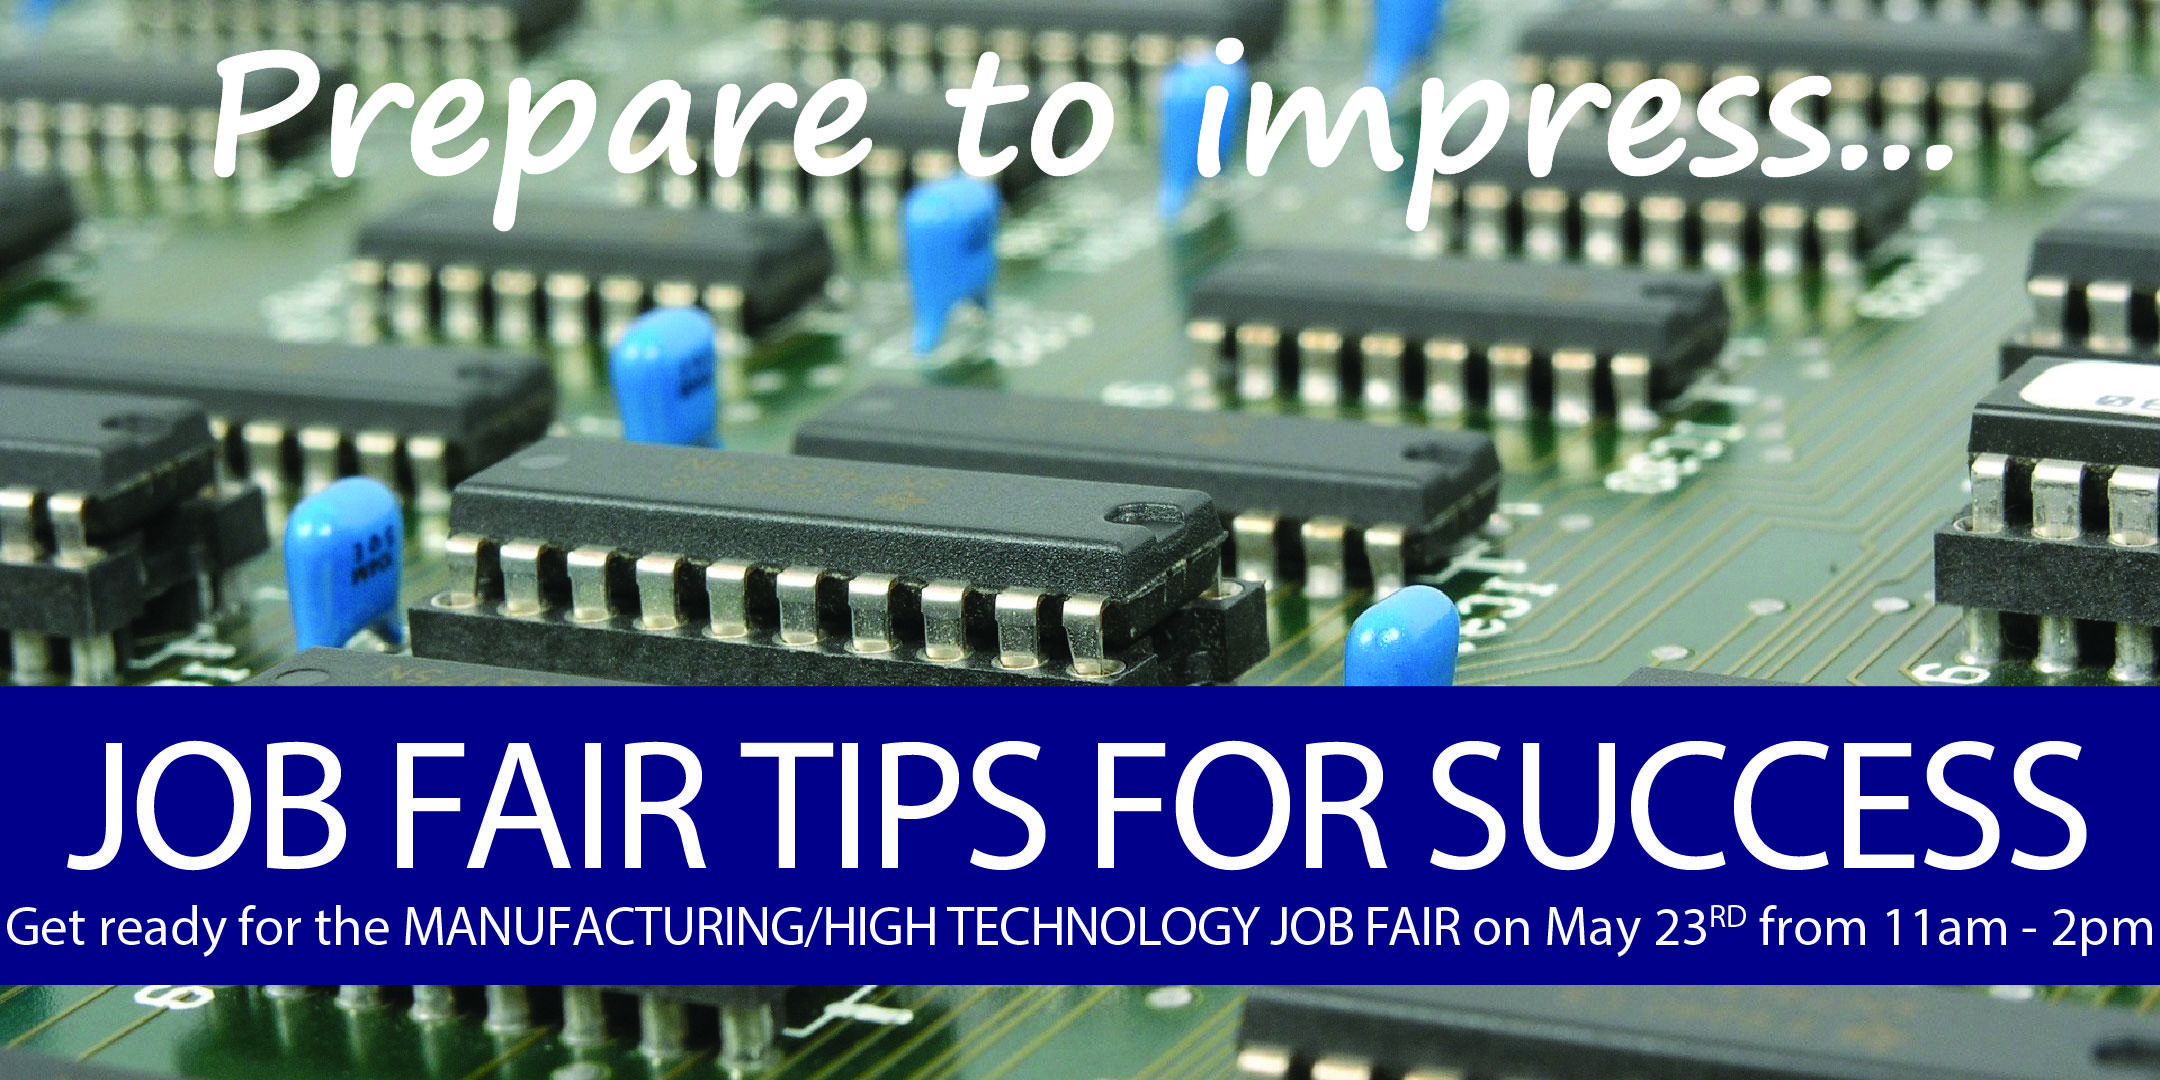 job fair tips for success manufacturing high technology sonoma job fair tips for success manufacturing high technology